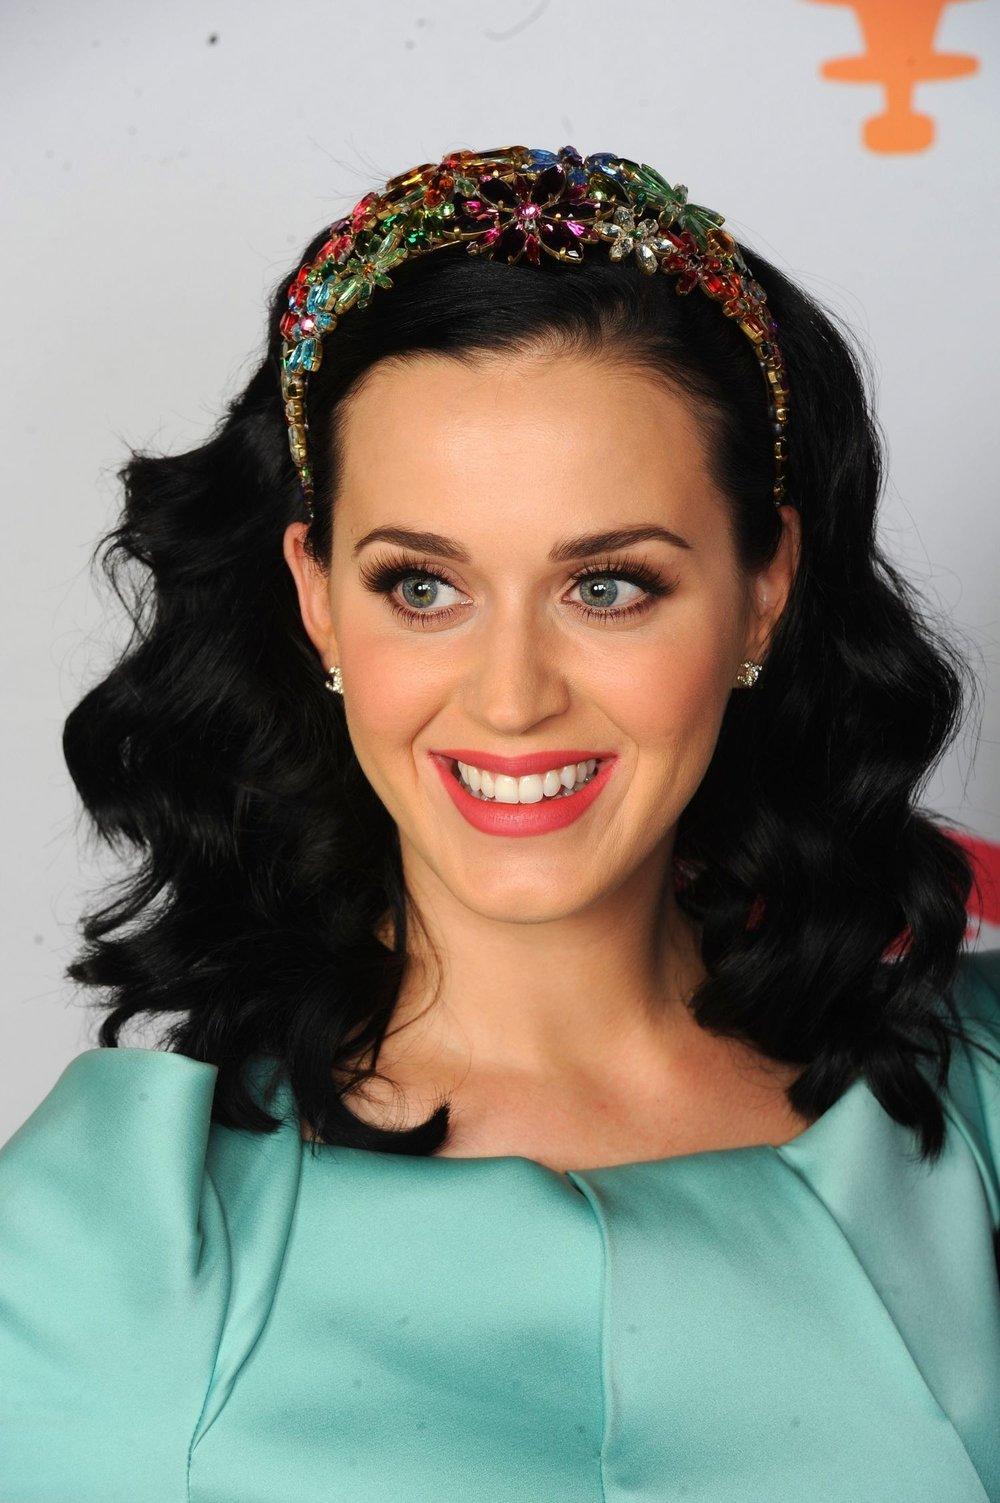 medium-how-to-style-hair-accessories-headbands-hairstyles-ways-to-wear-katyperry-jewel-embellished-ornate.jpg